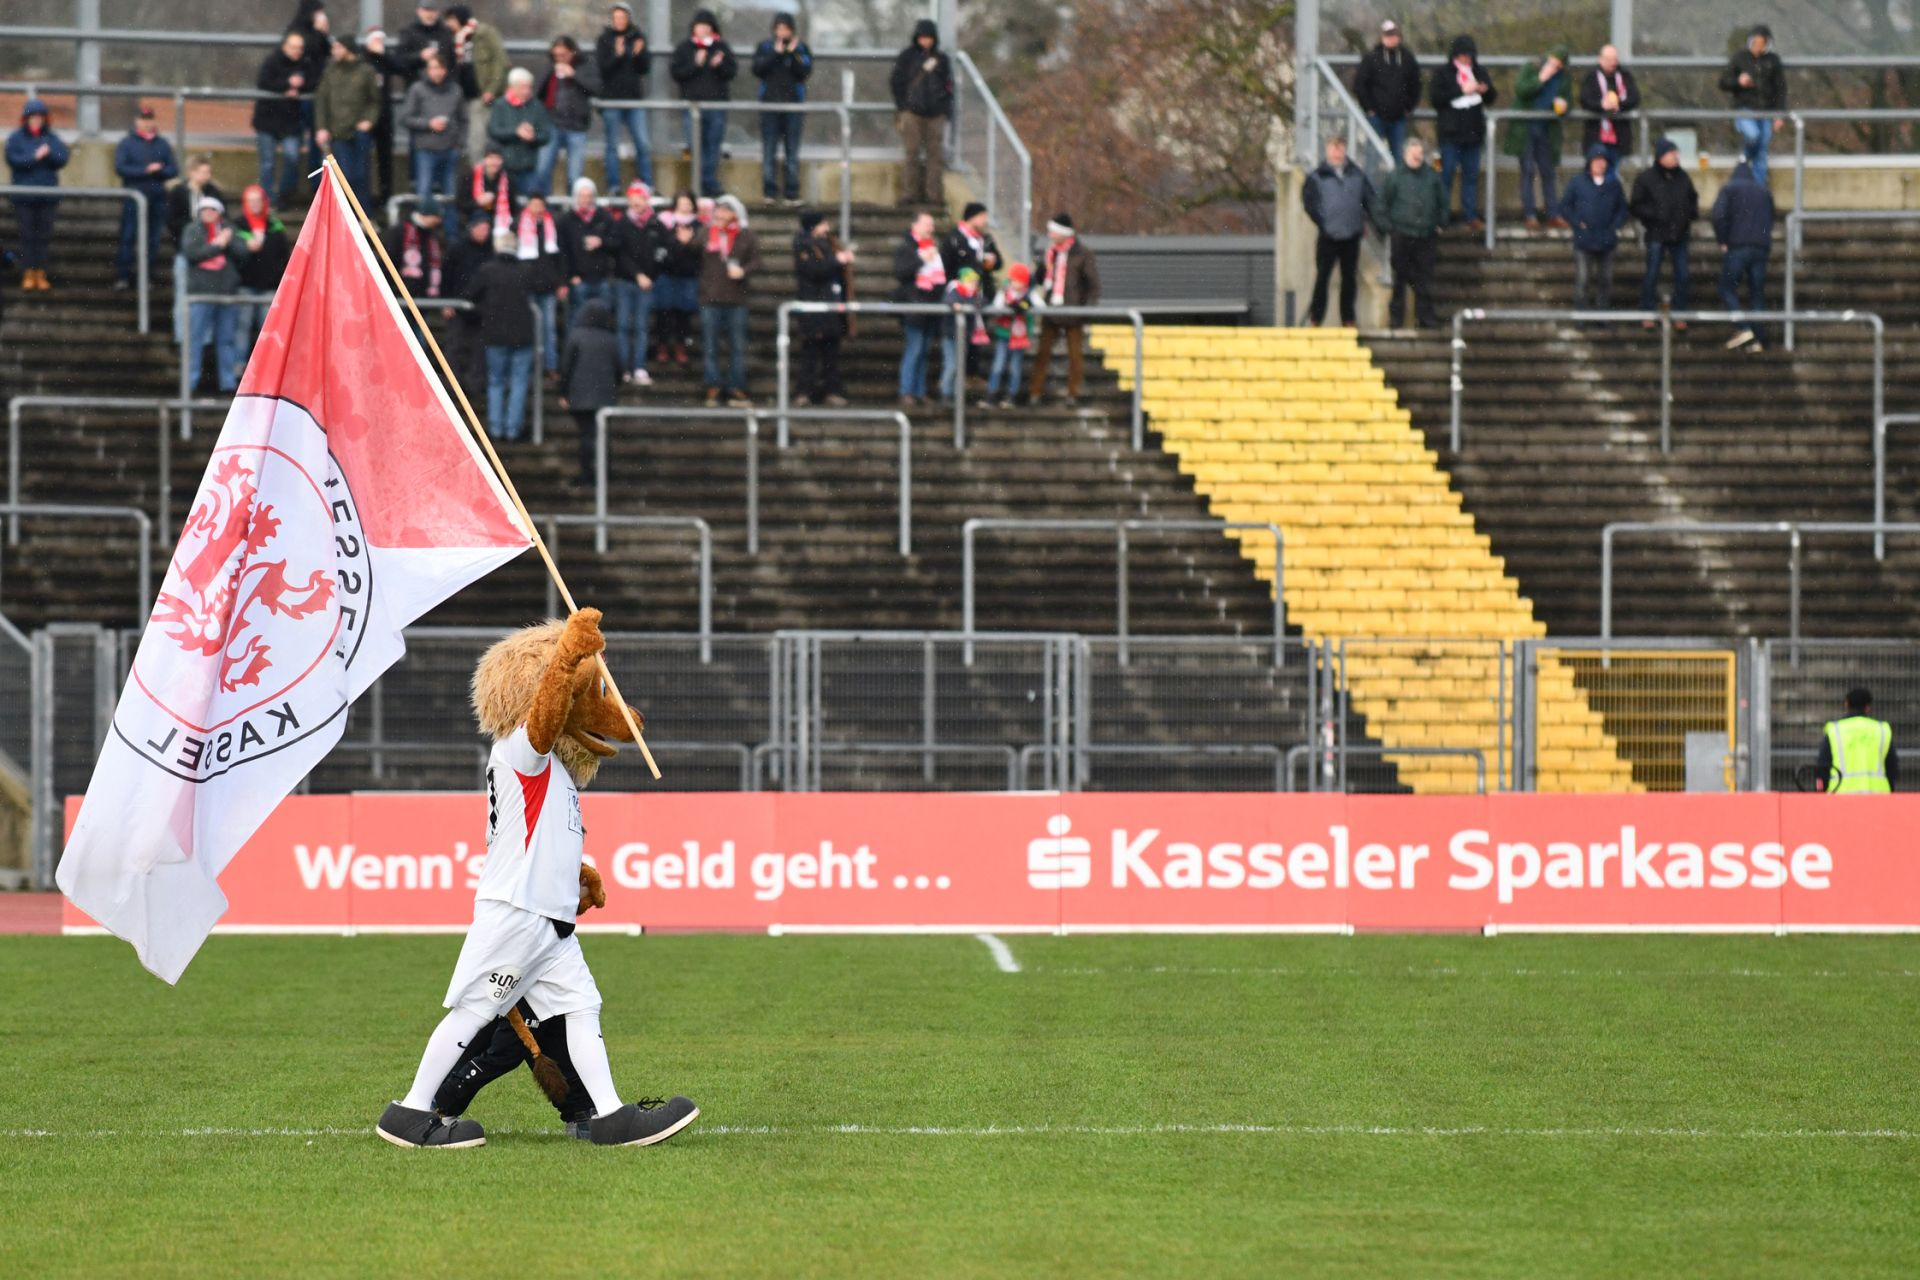 Lotto Hessenliga 2019/2020, KSV Hessen Kassel, FV Bad Vilbel, Endstand 6:1